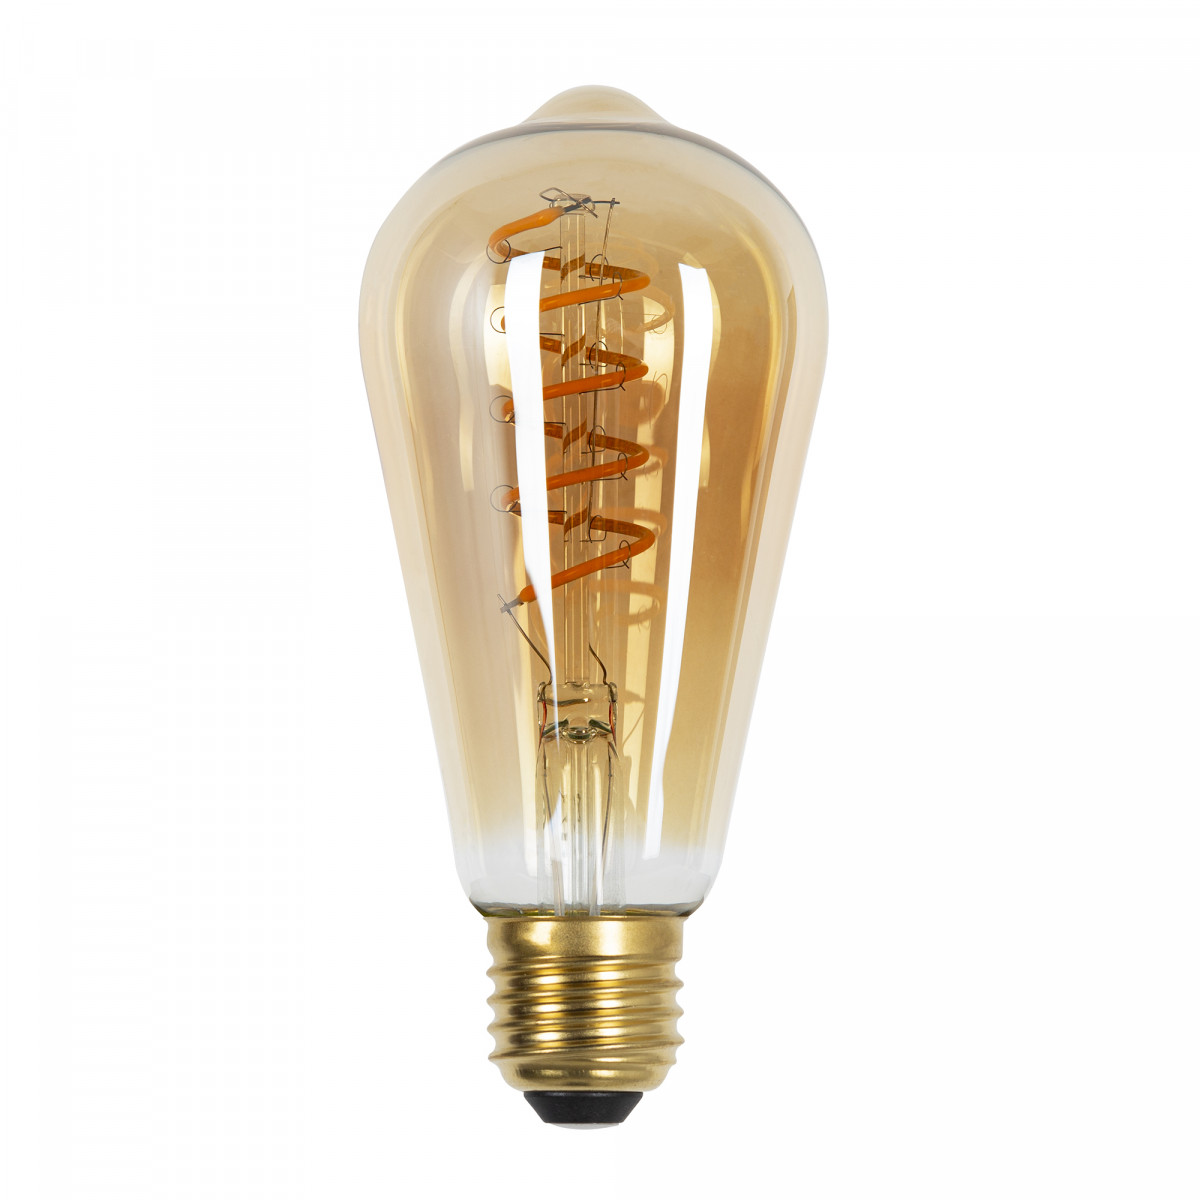 6-pack ledlamp Rustic Spiral - 4 Watt - 220 Lumen